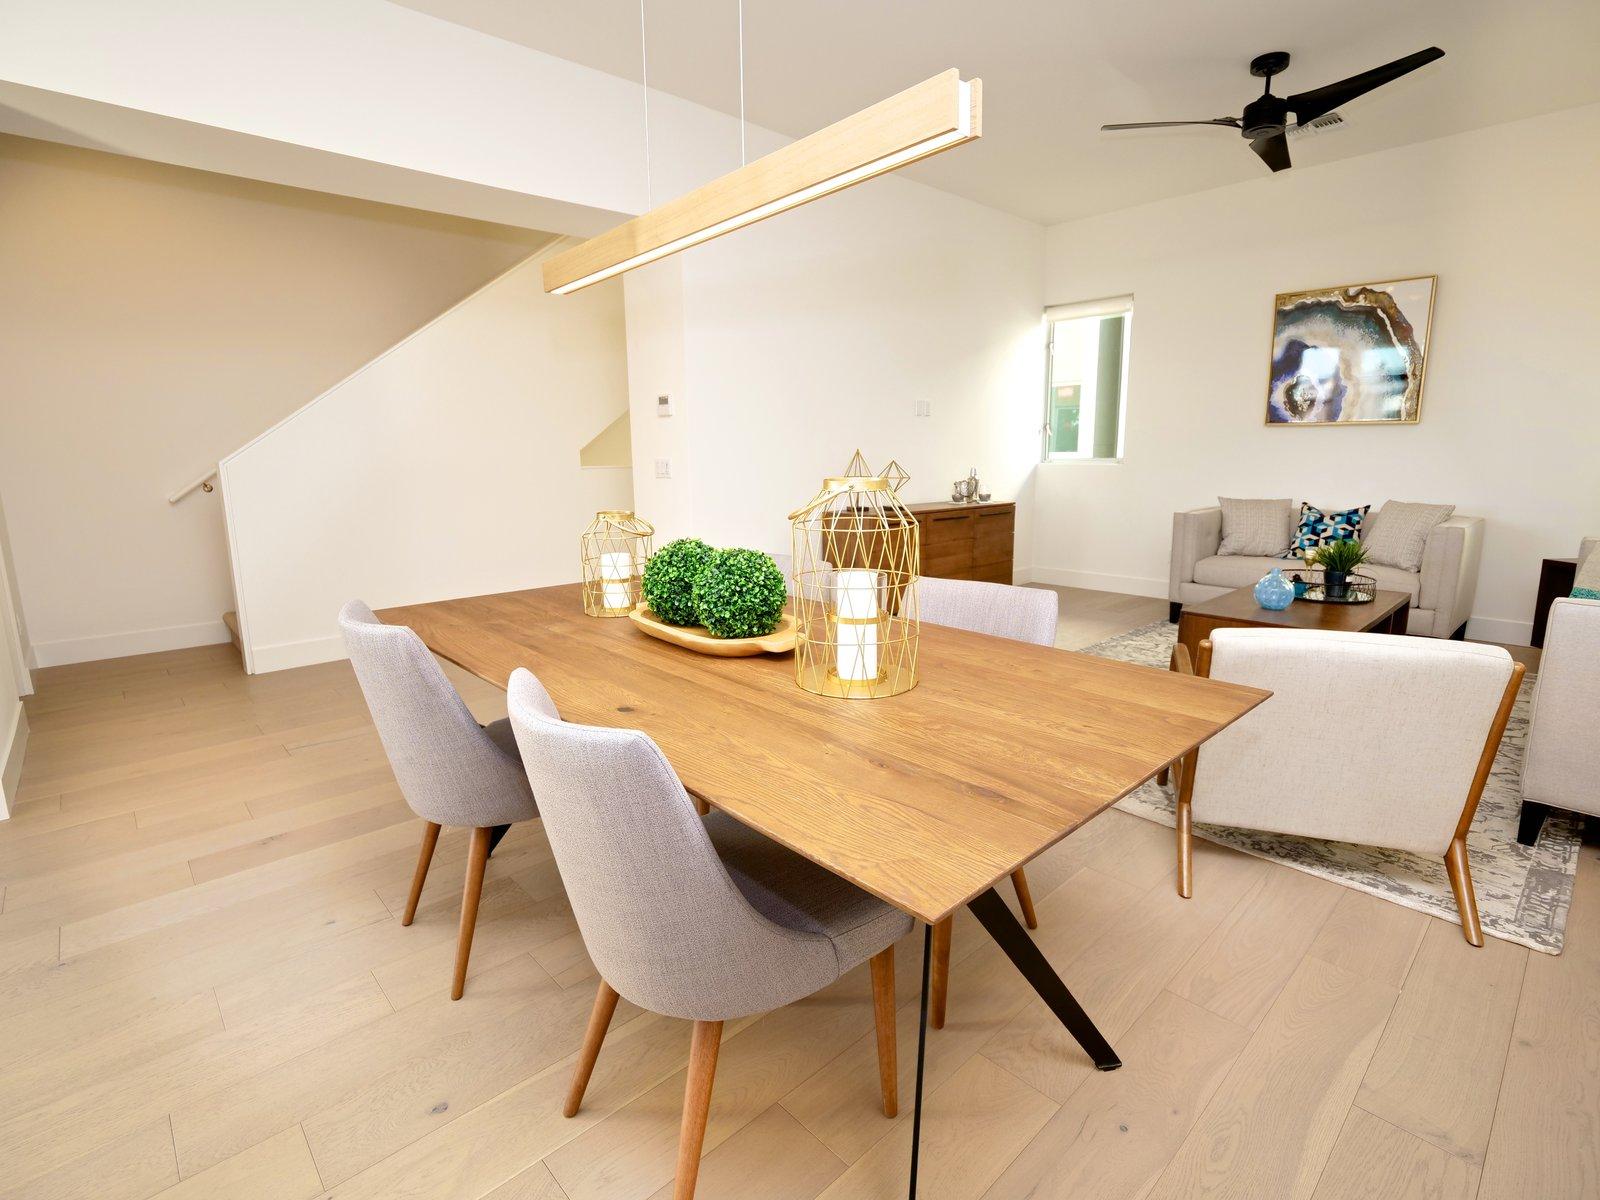 Dining Room, Table, and Medium Hardwood Floor Open floor plan concept with wood flooring and modern fixtures.  Stacks Modern